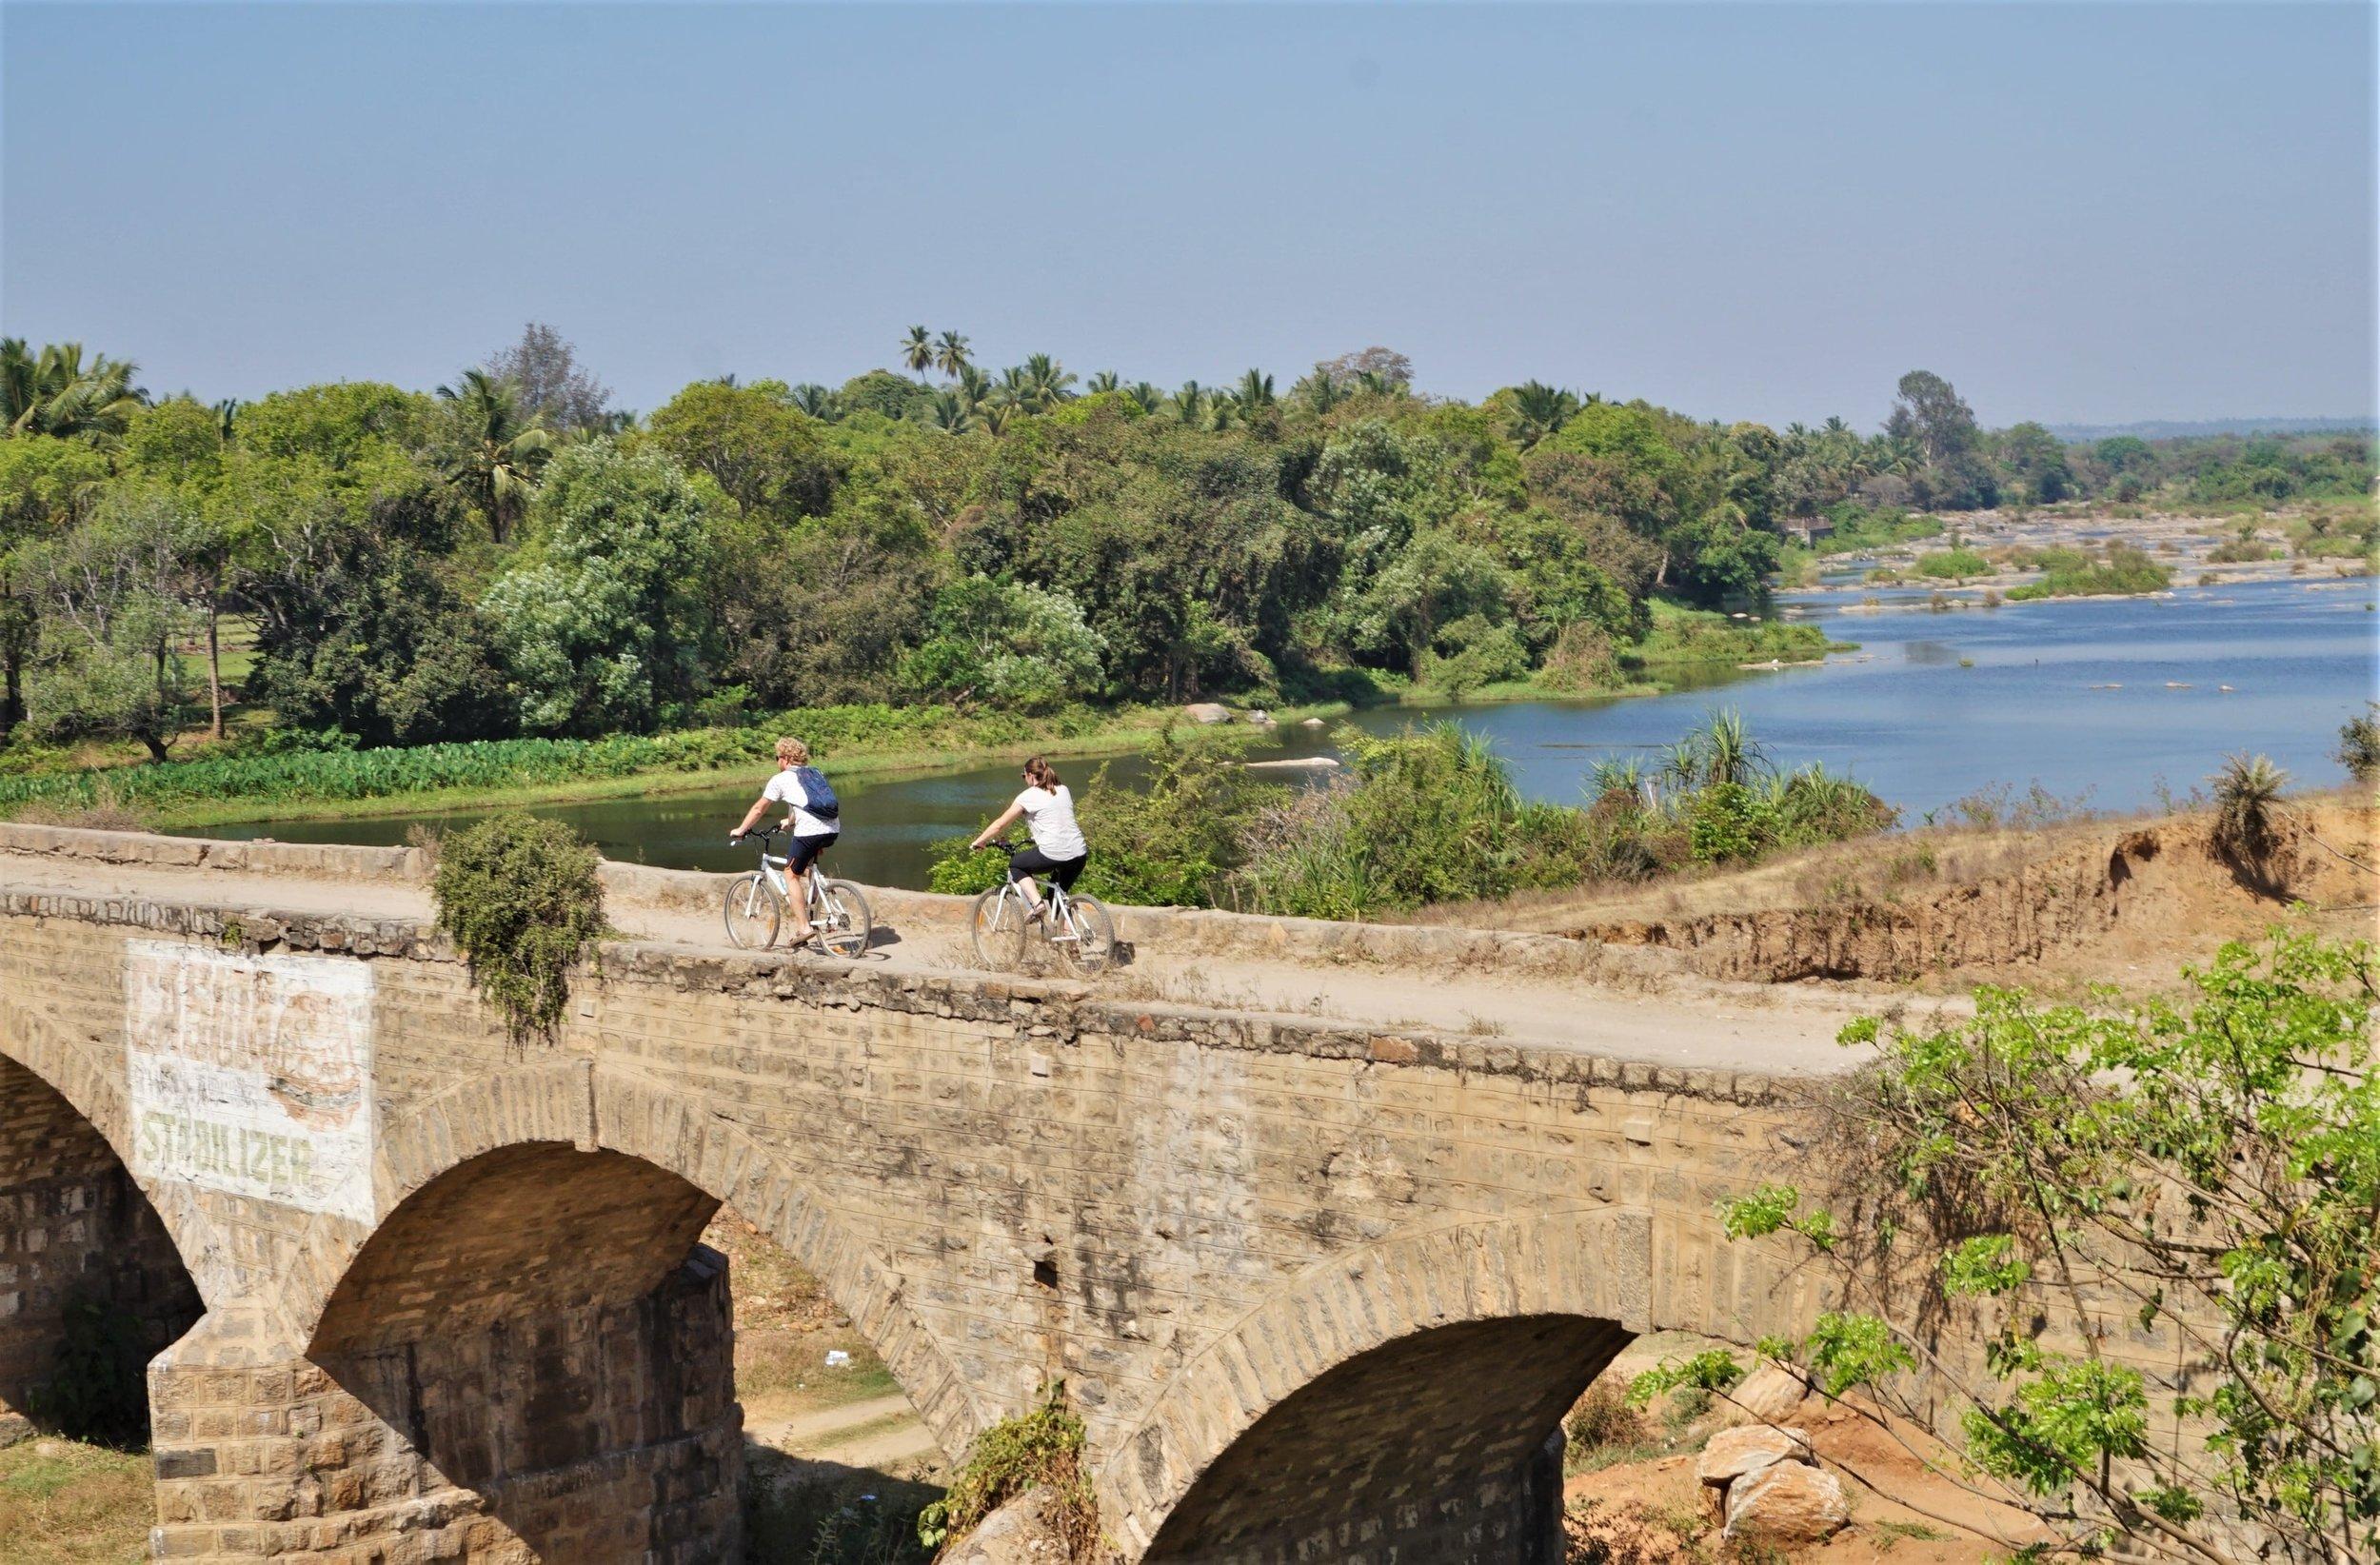 Explore the region around Mysore by bike!